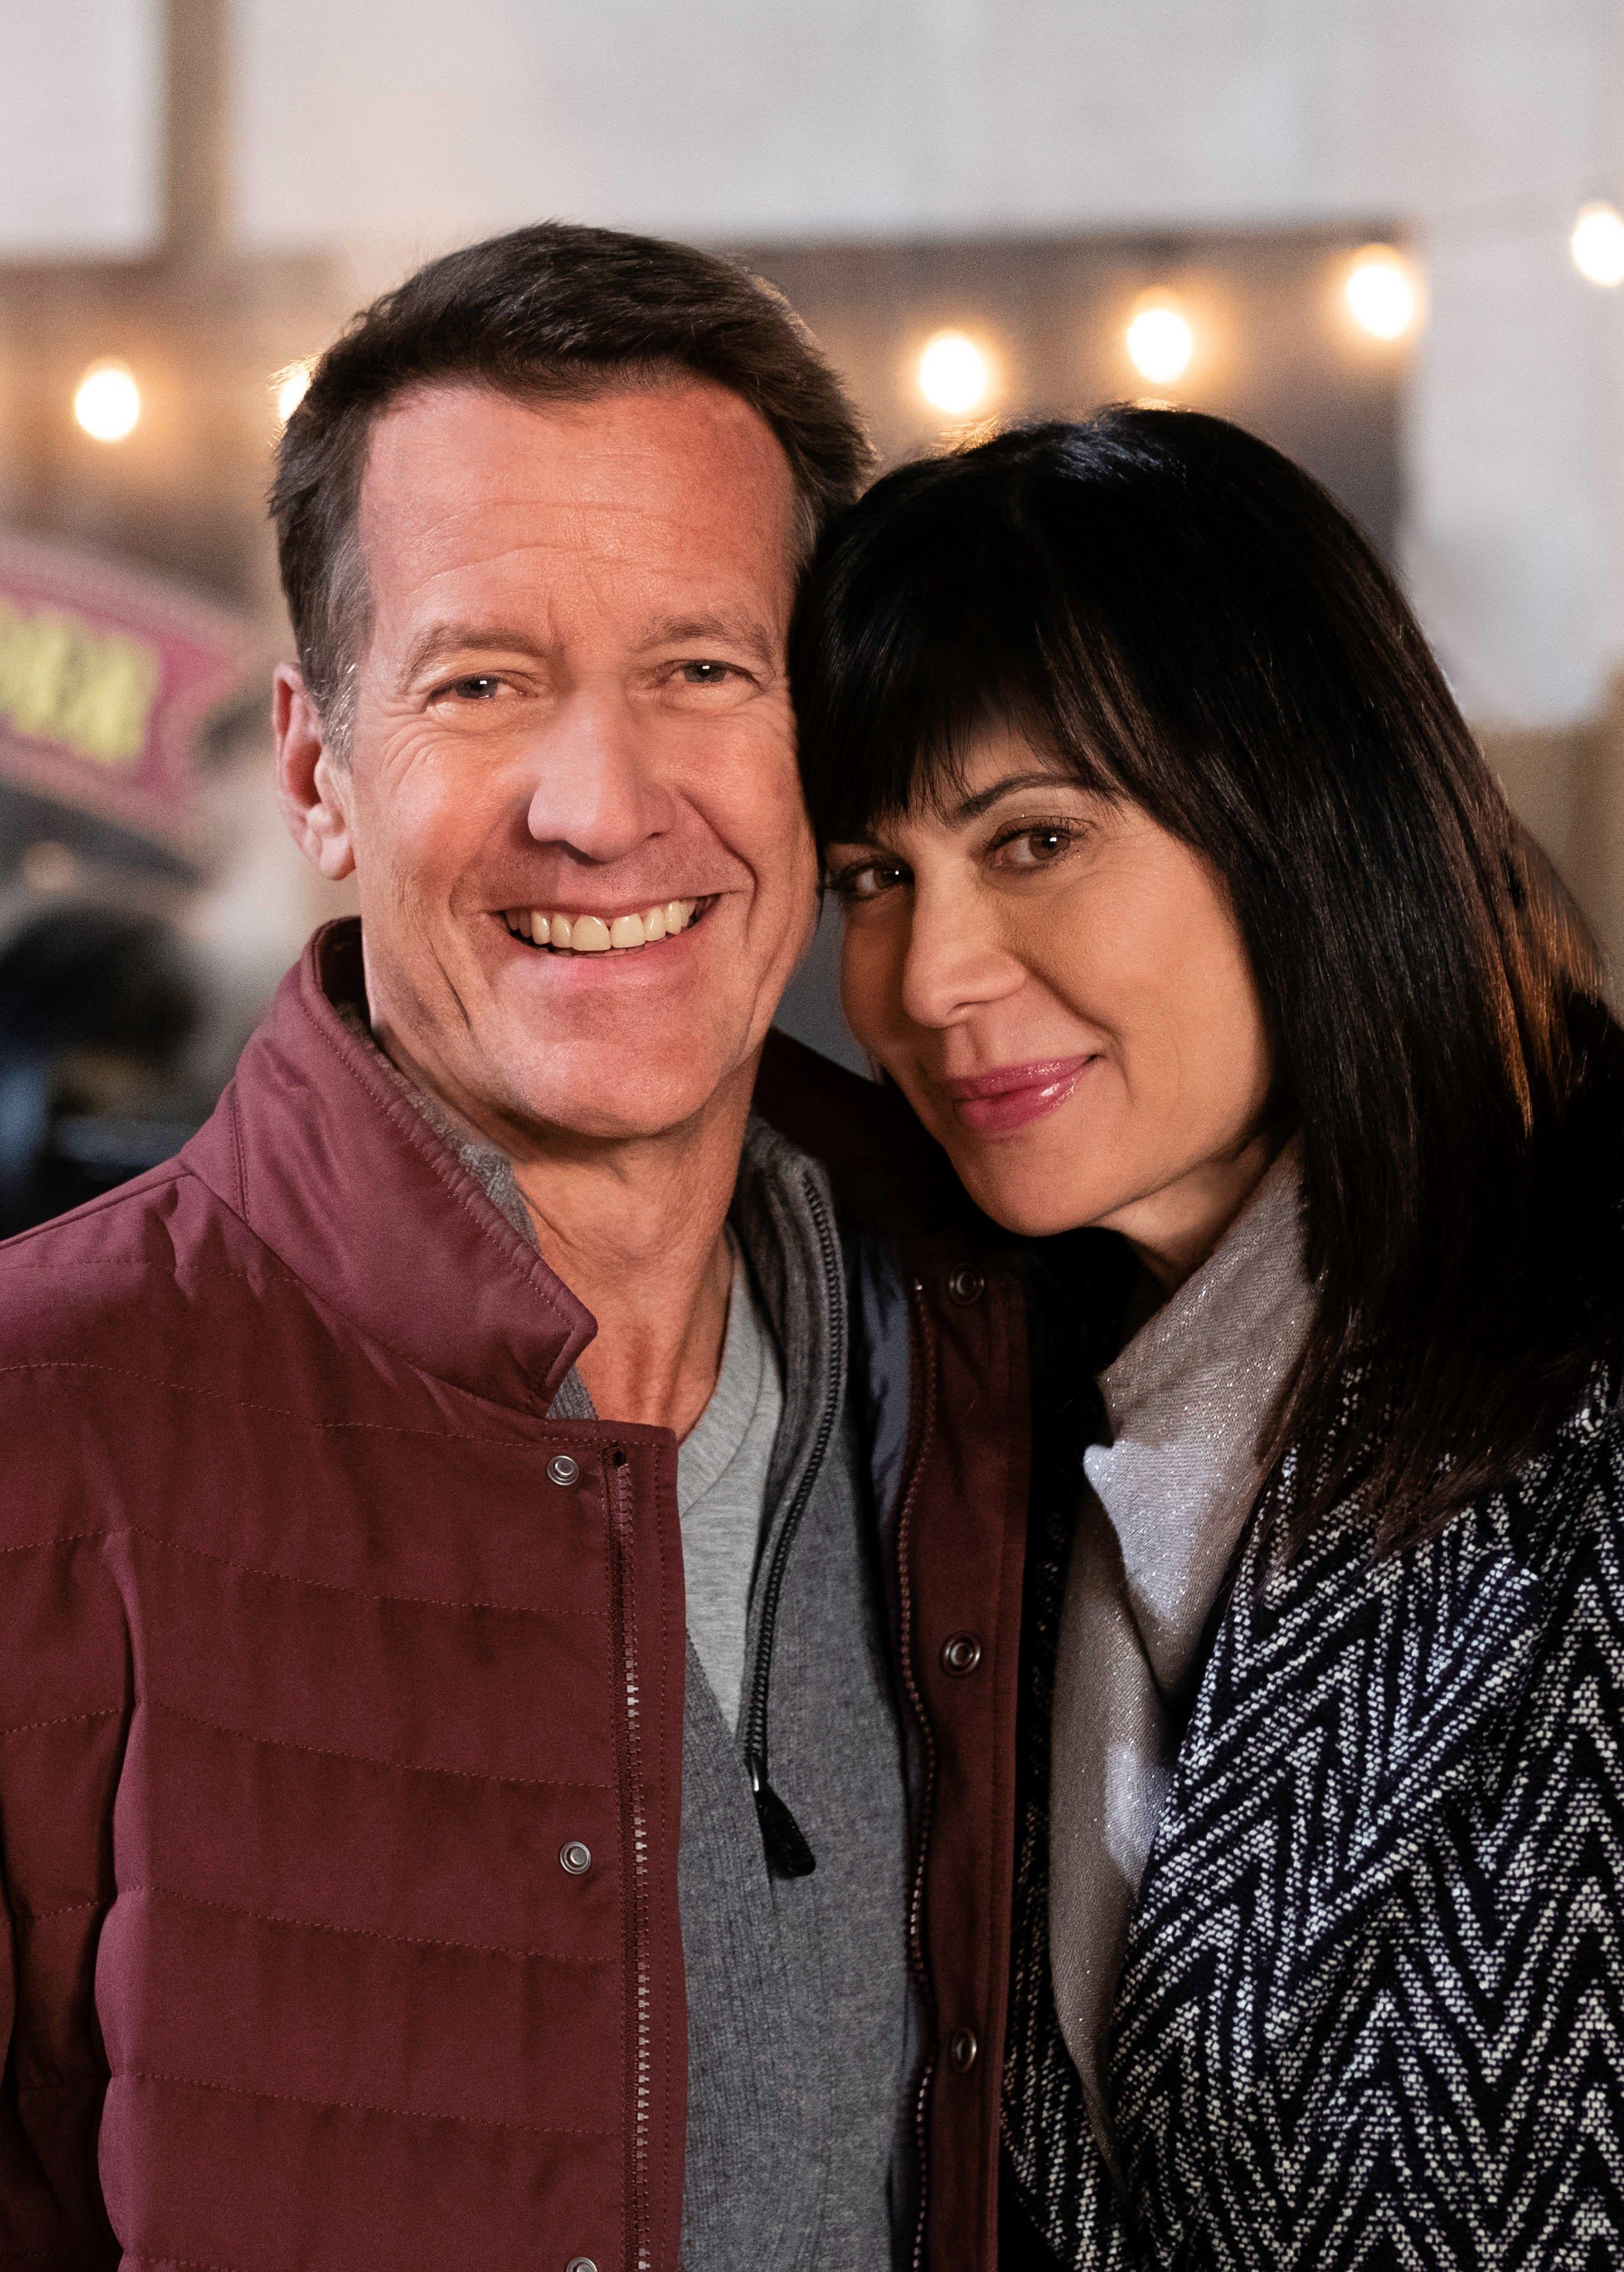 Happy In Love - Good Witch Season 5 Episode 8 - TV Fanatic